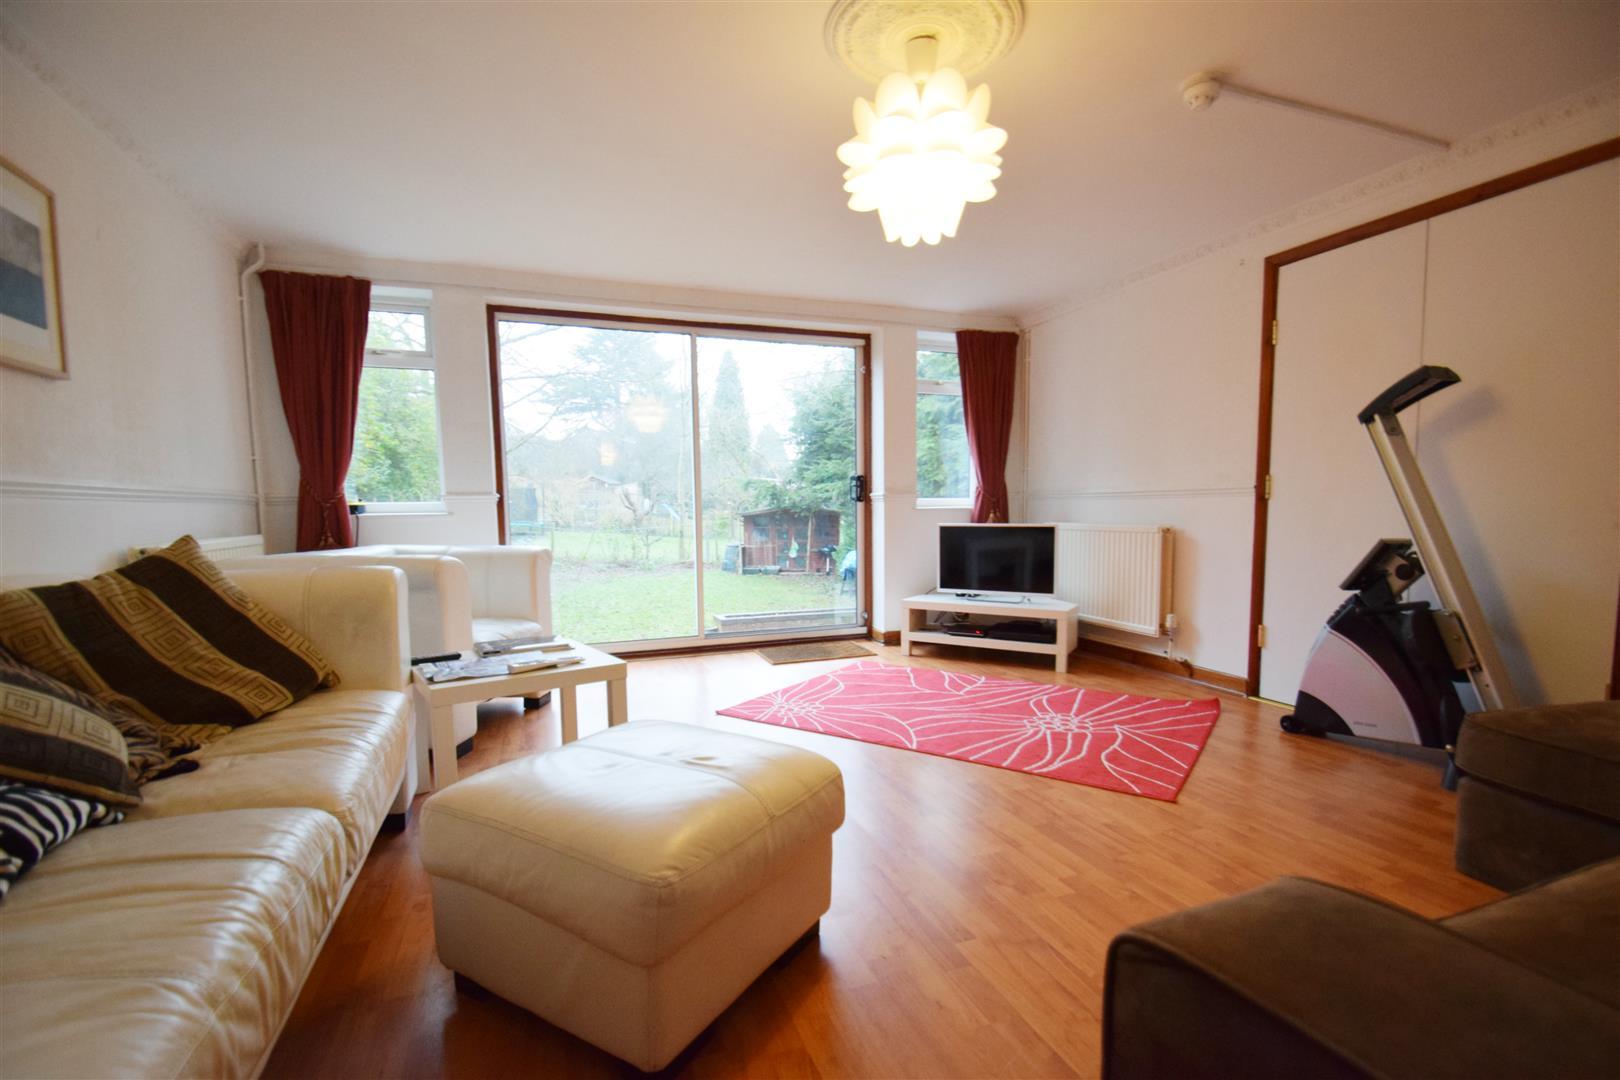 Caversham House Reception Room